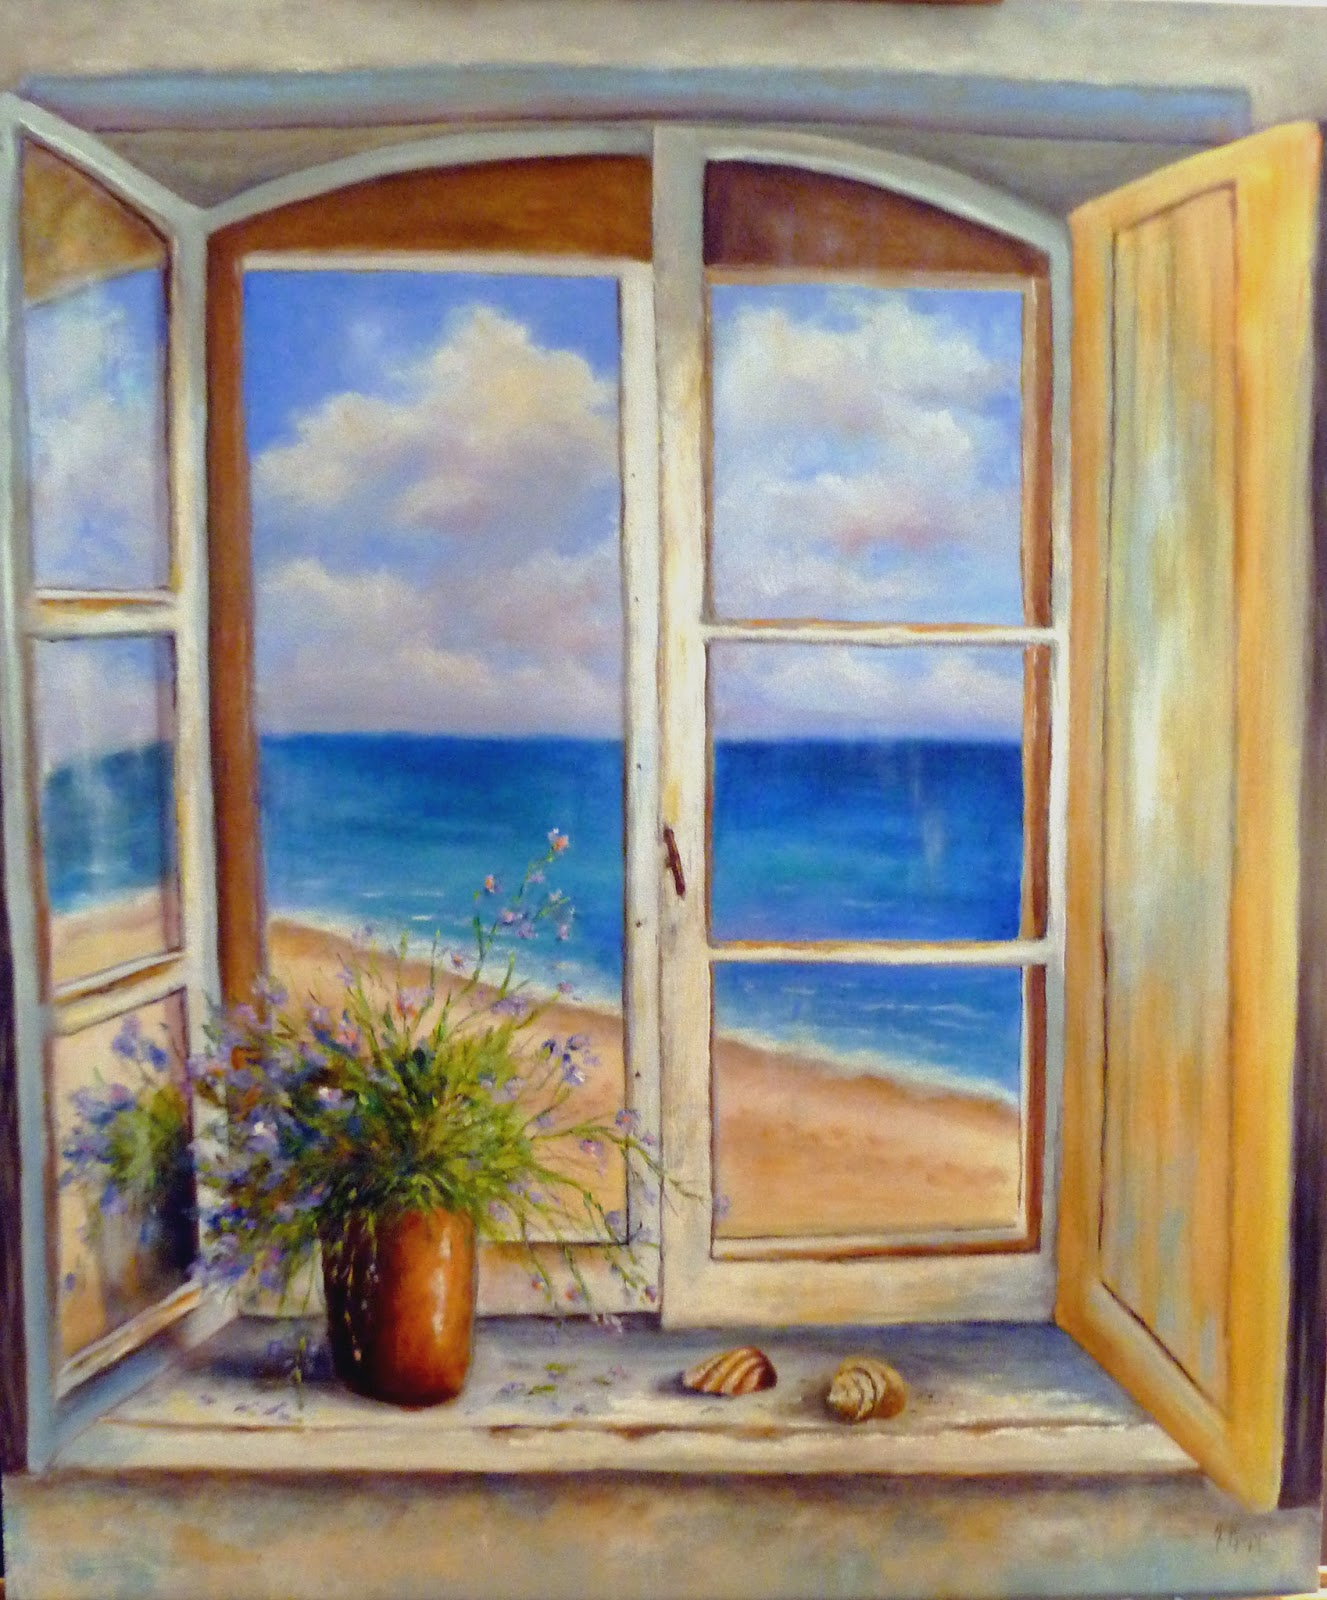 an artist 39 s journey On window painting